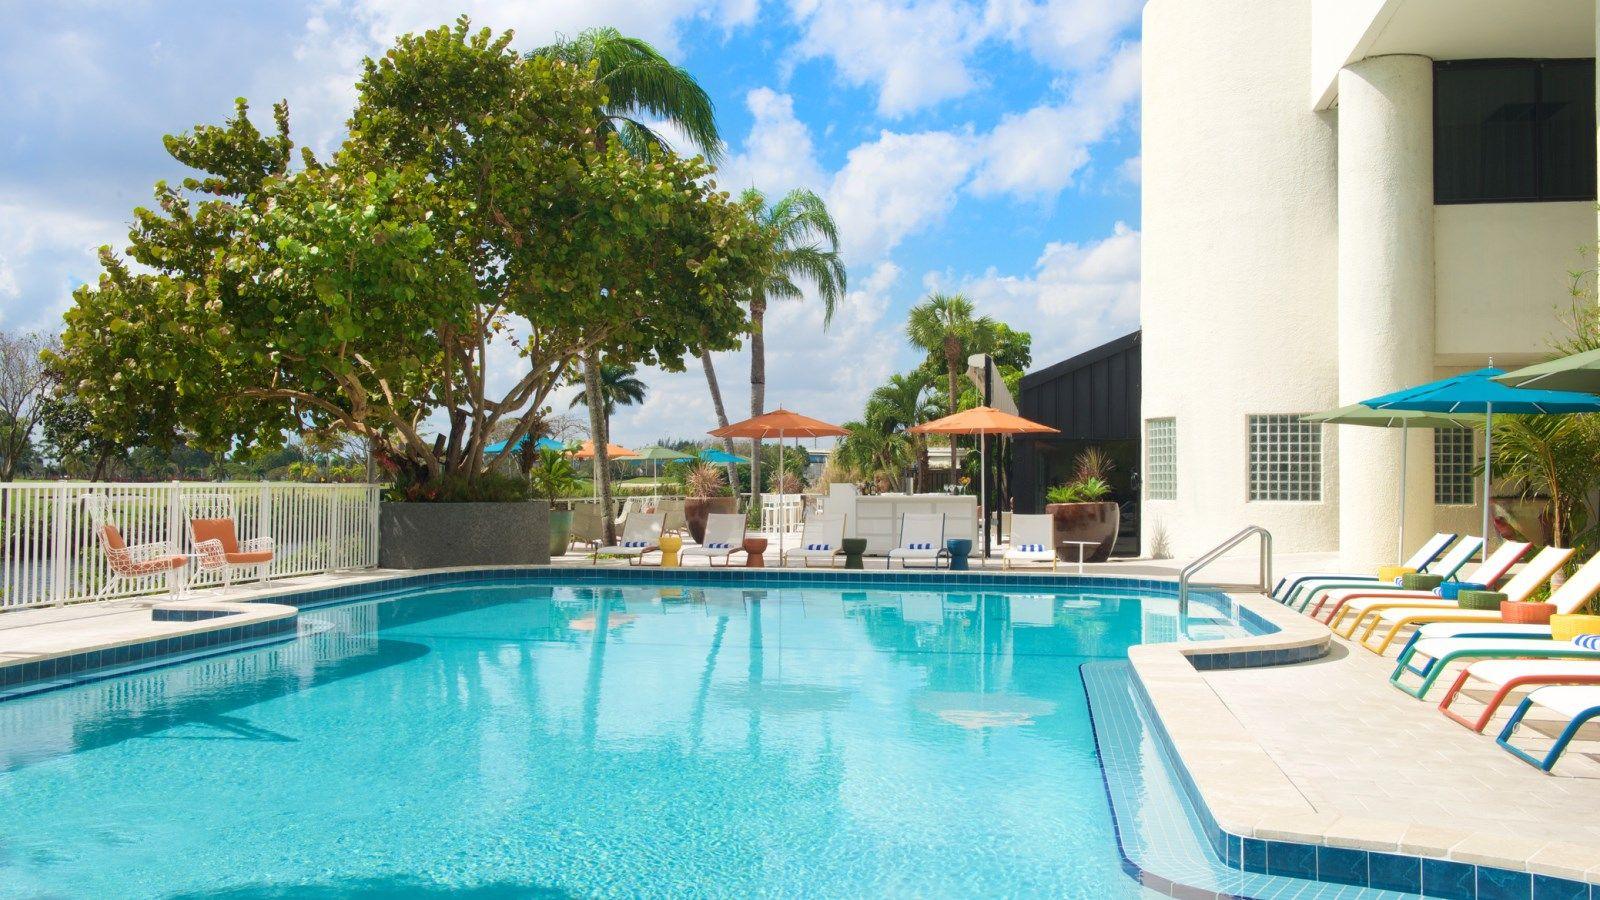 Sheraton Miami Airport Hotel & Executive Meeting Center image 8